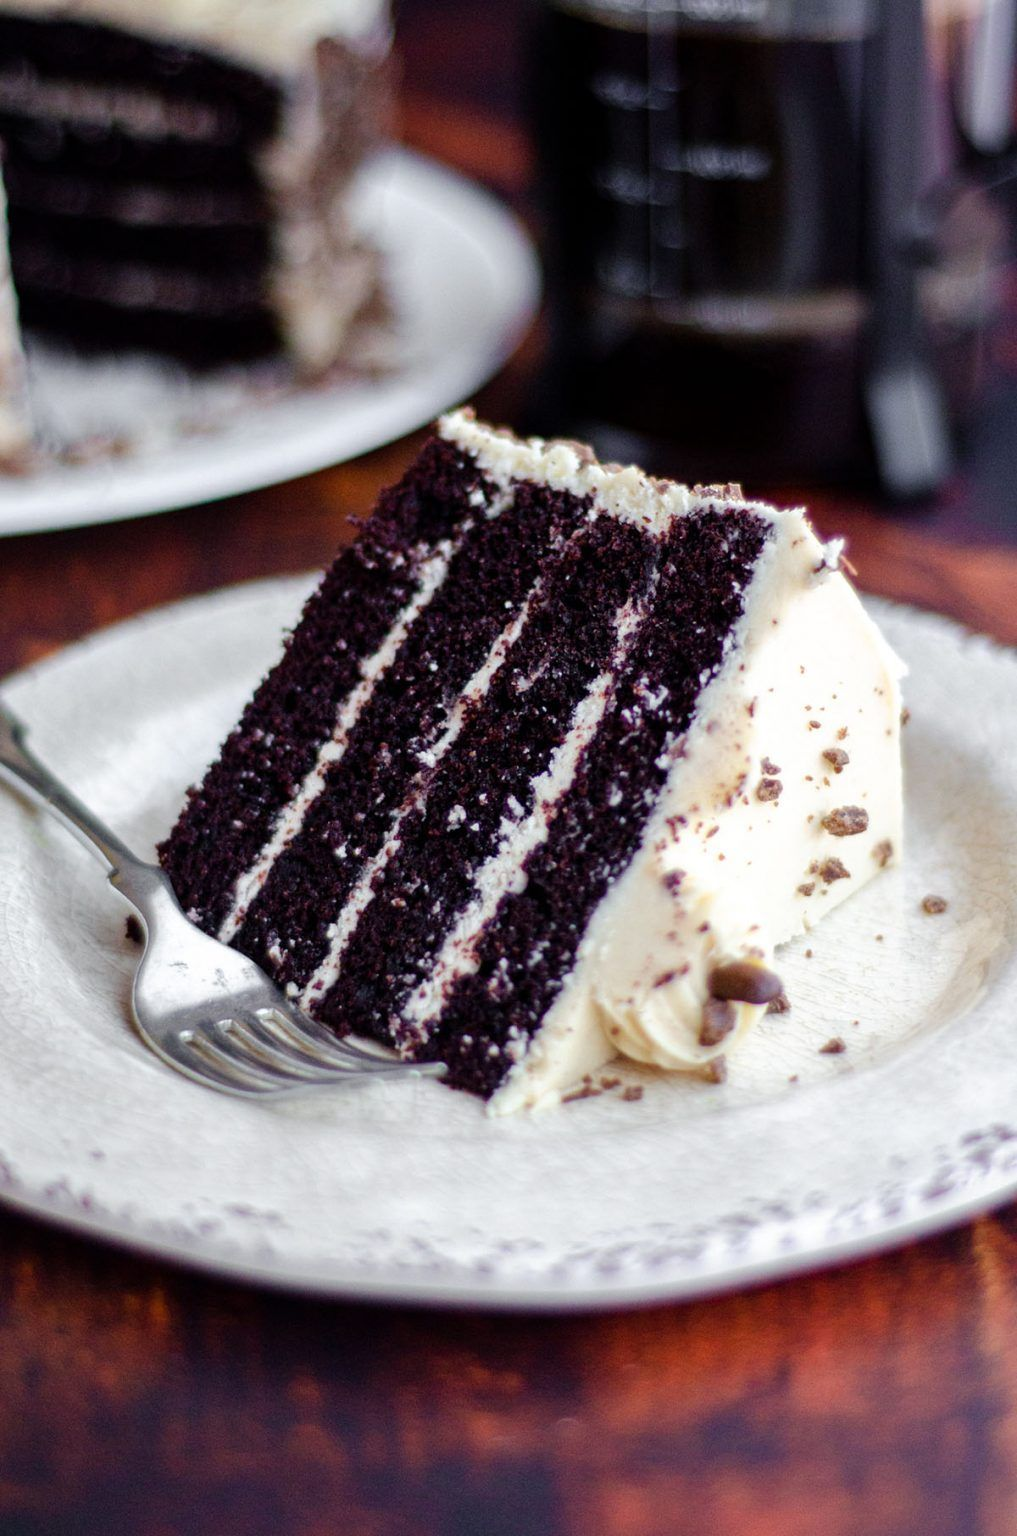 Mocha Cake with Coffee Buttercream Rich chocolate cake